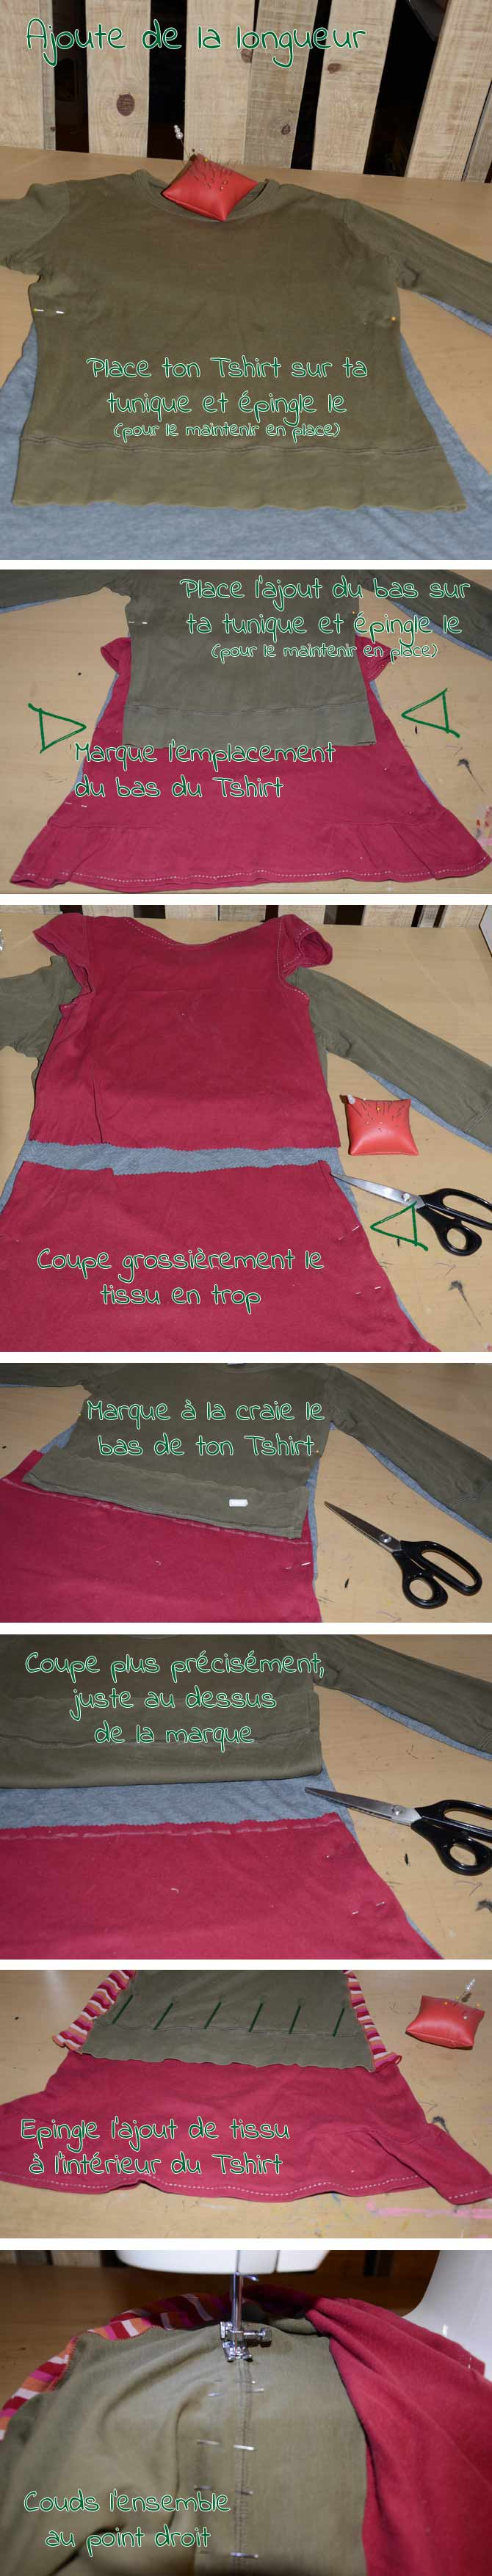 DIY: Transformer un Tshirt en tunique - coudre les côtés